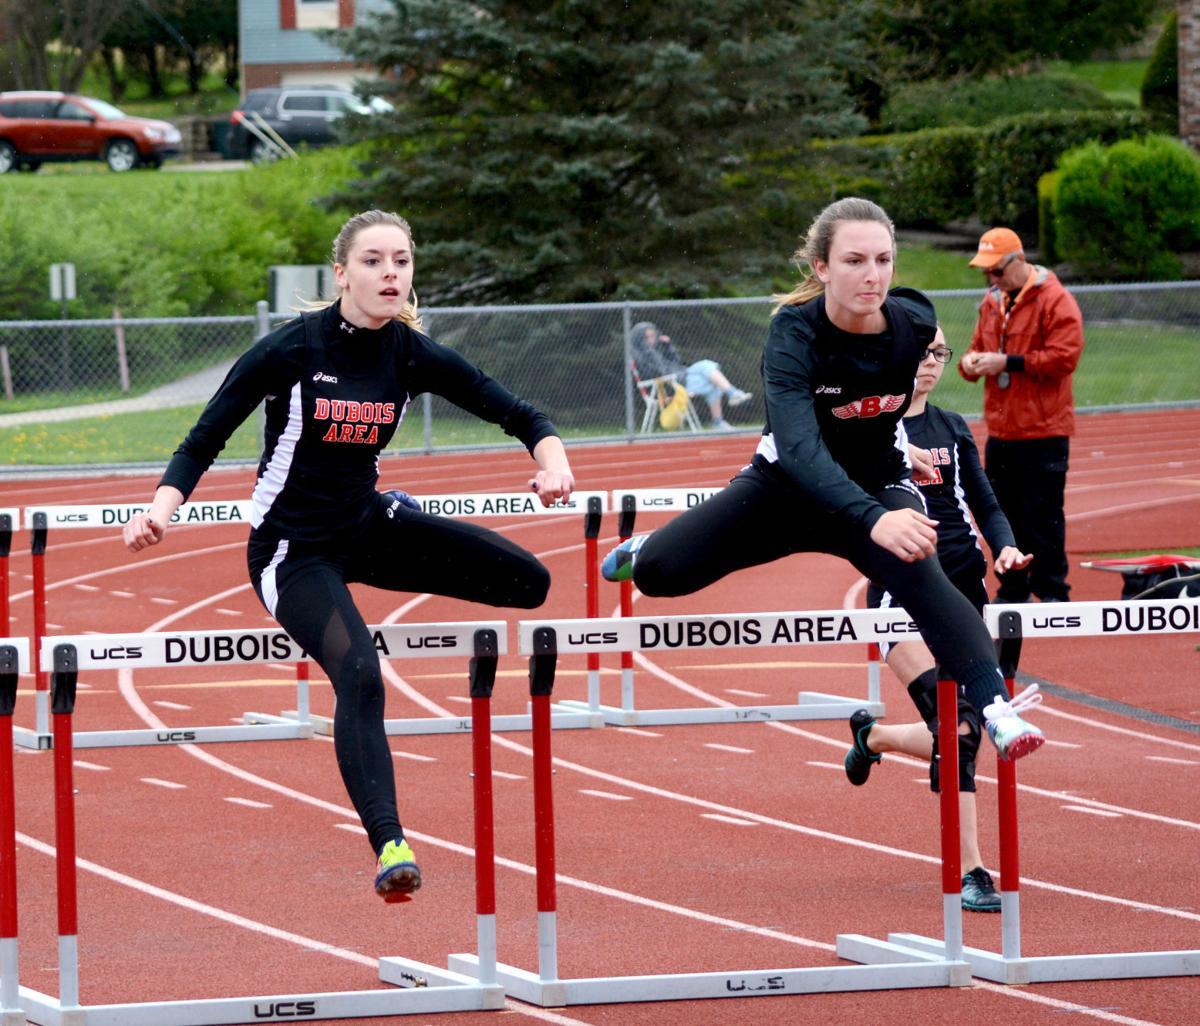 20170426-ce-sp King-McGriff hurdles